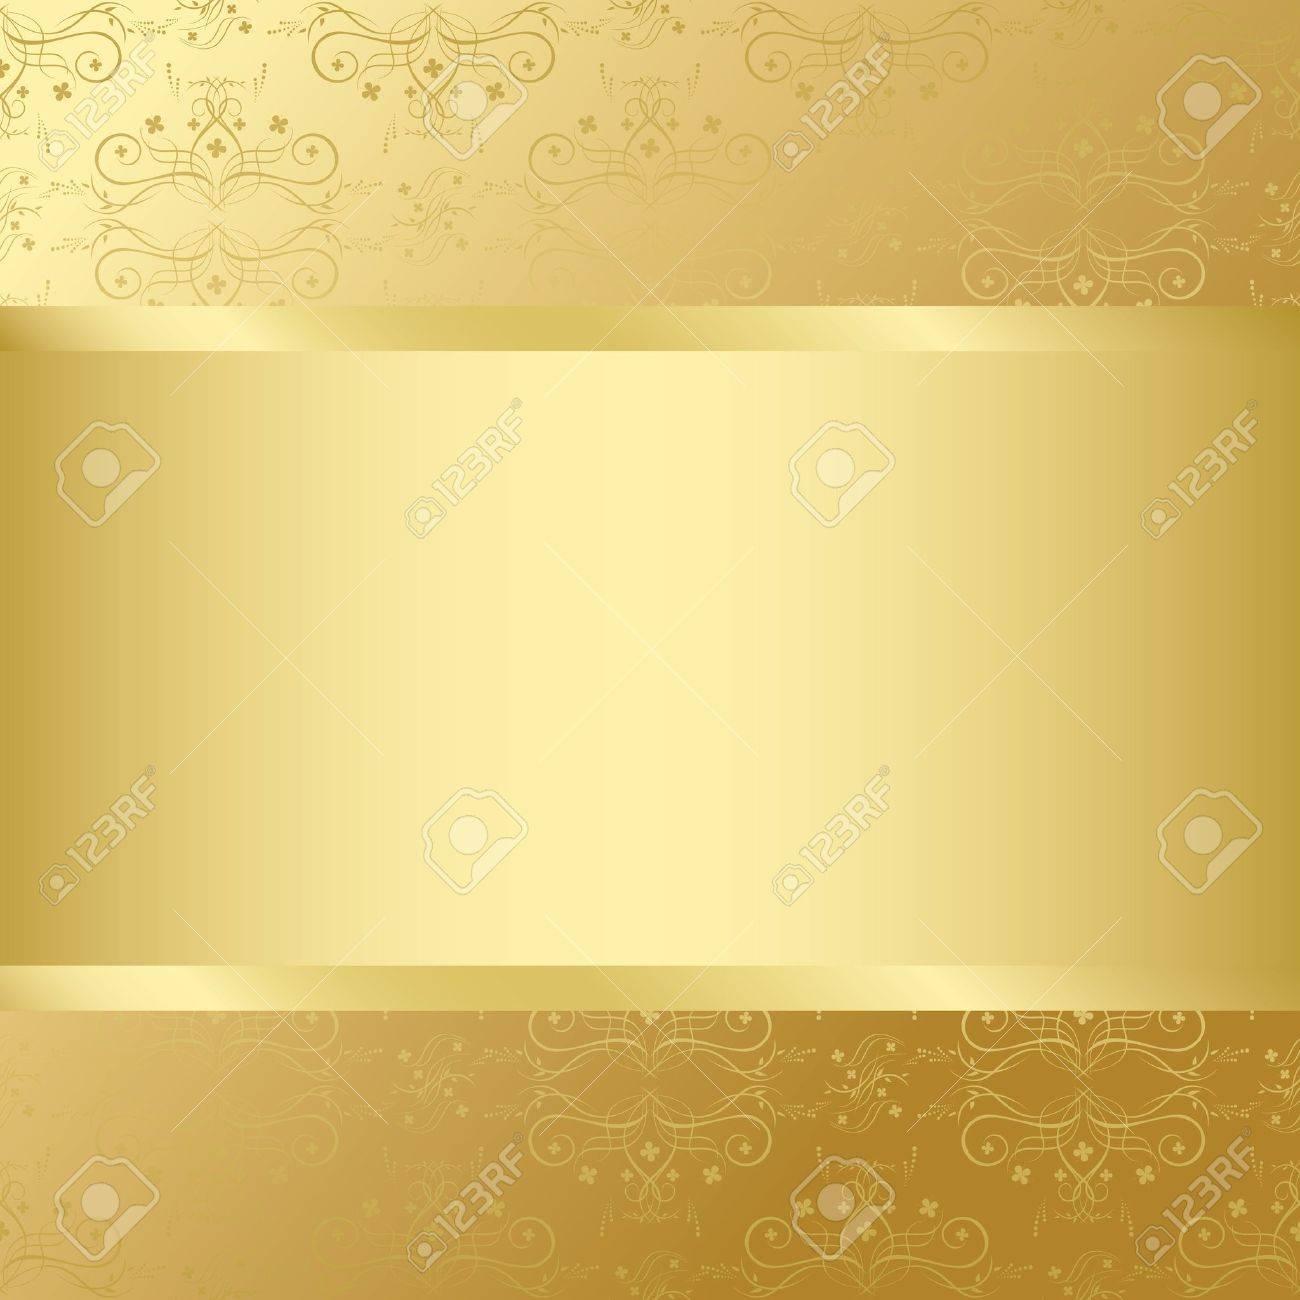 Golden Texture And Center